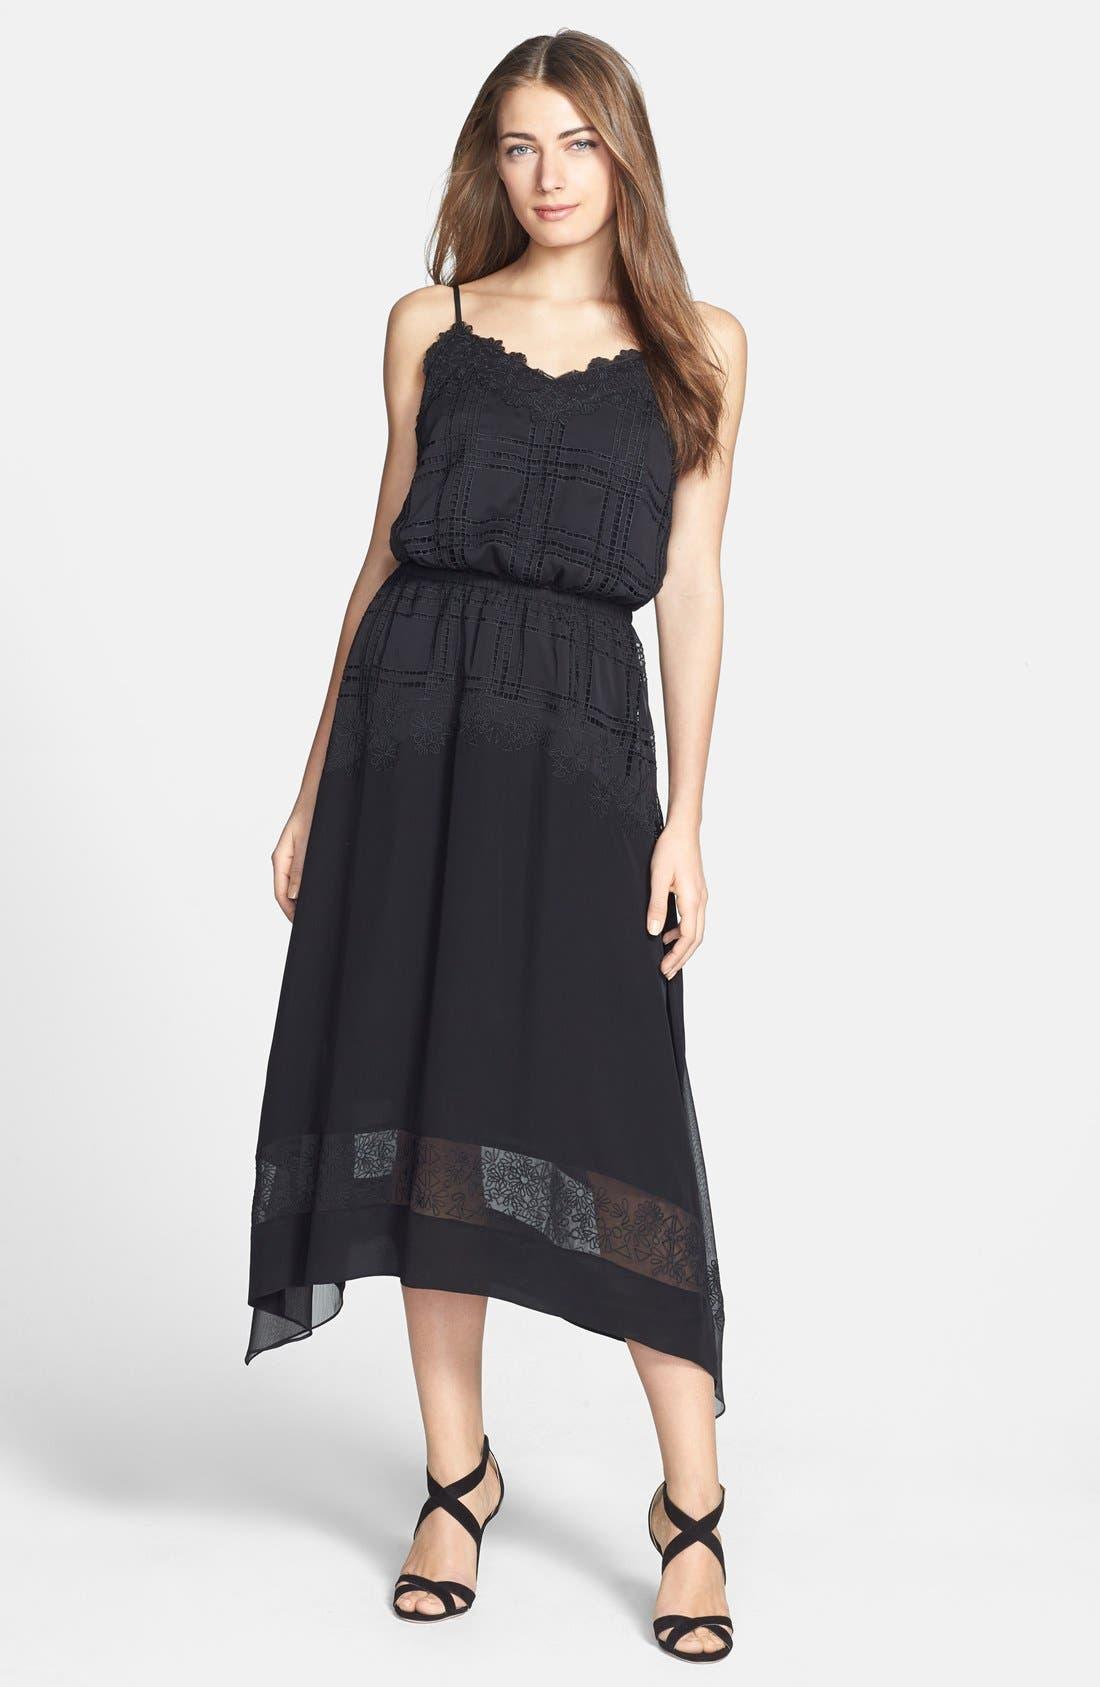 Alternate Image 1 Selected - Rebecca Minkoff 'Suarez' Embroidered Silk Blouson Dress